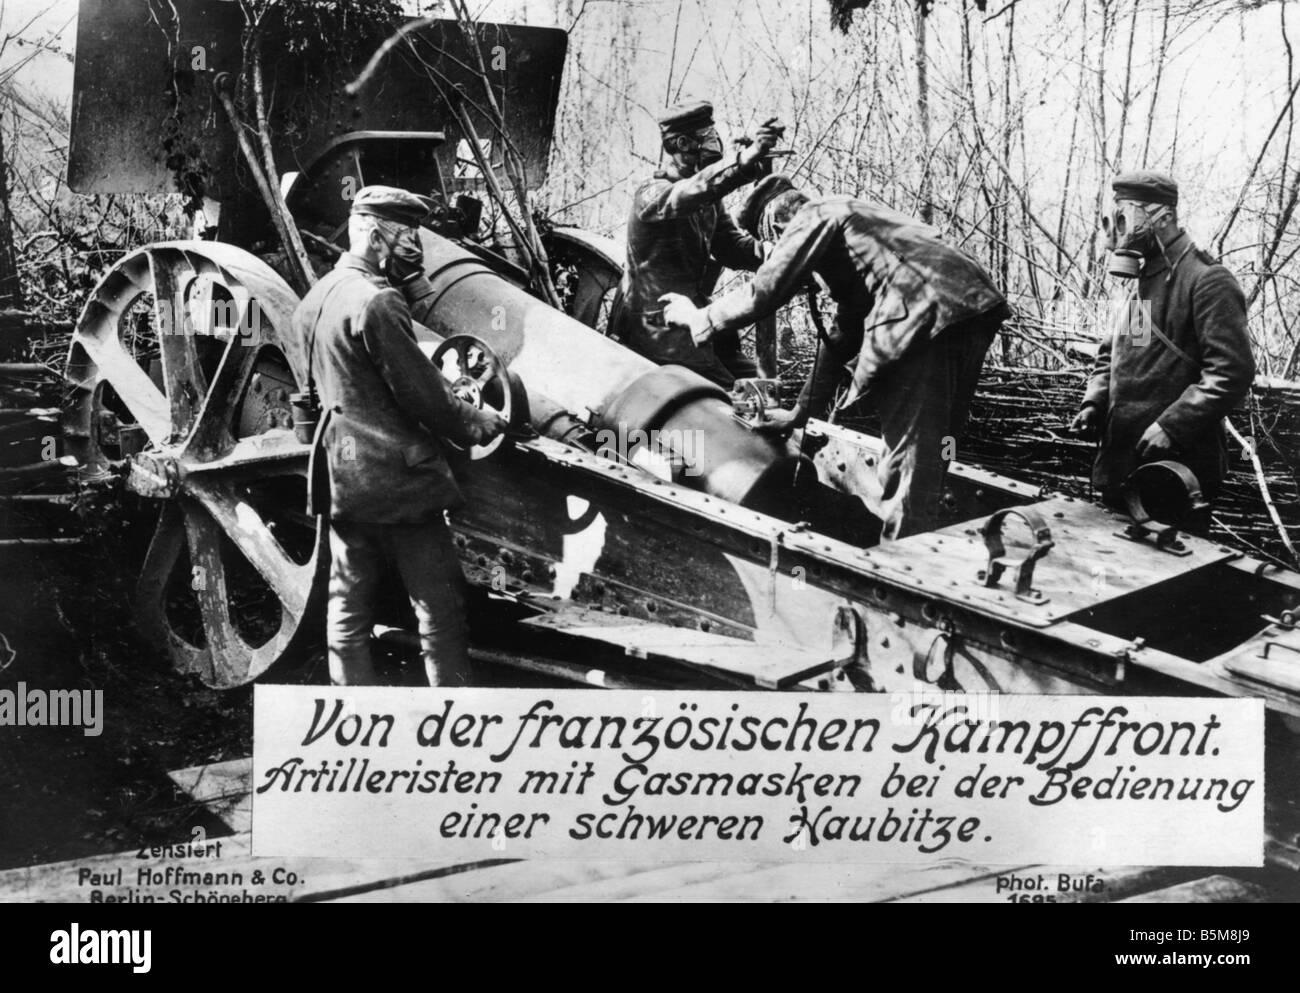 2 G55 G1 1914 German howitzer World War I History World War I Gas war German artillerymen with gasmasks load a heavy - Stock Image